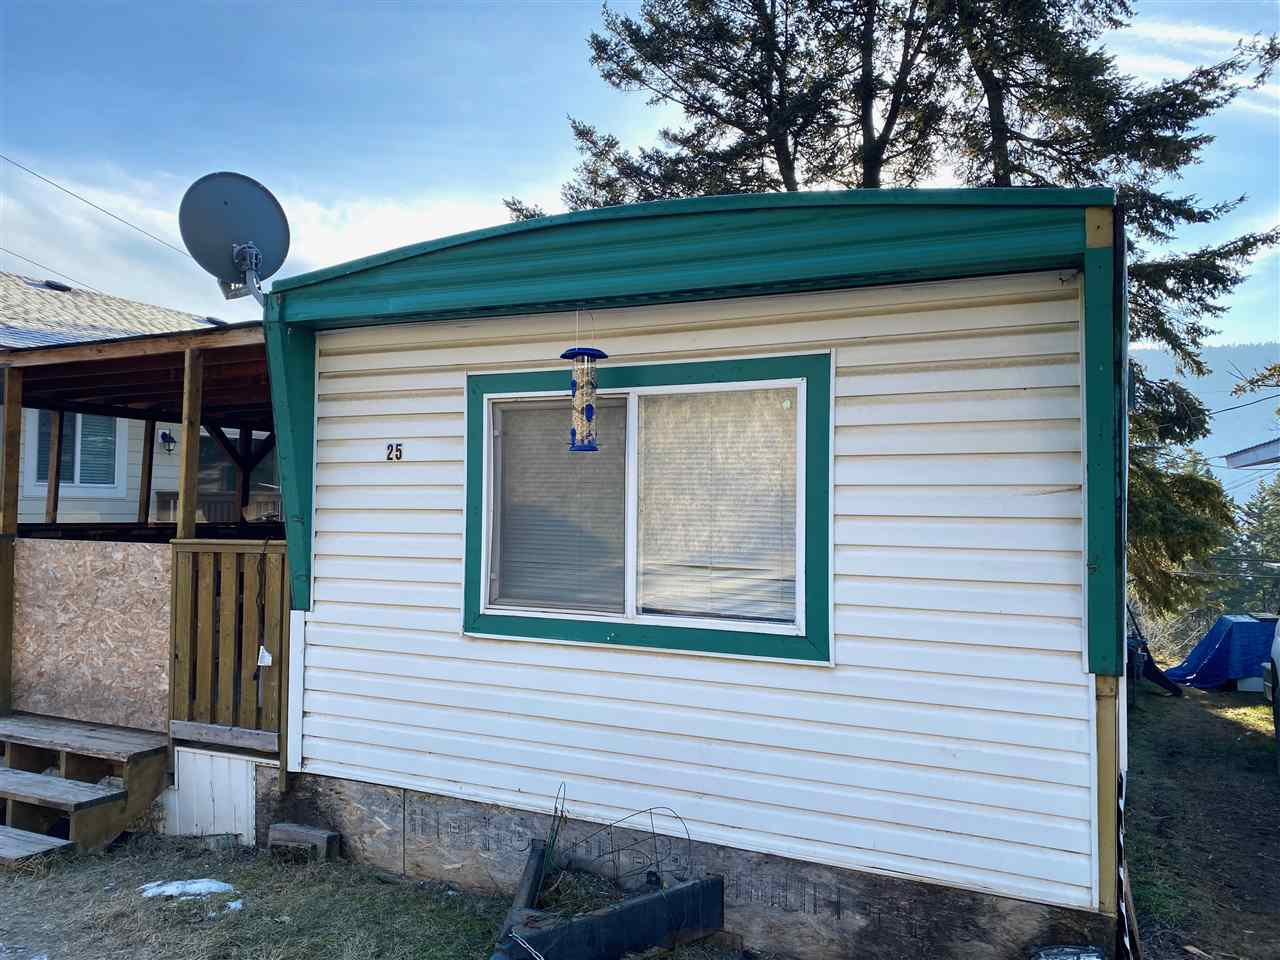 Main Photo: 25 560 SODA CREEK Road in Williams Lake: Williams Lake - Rural North Manufactured Home for sale (Williams Lake (Zone 27))  : MLS®# R2526857